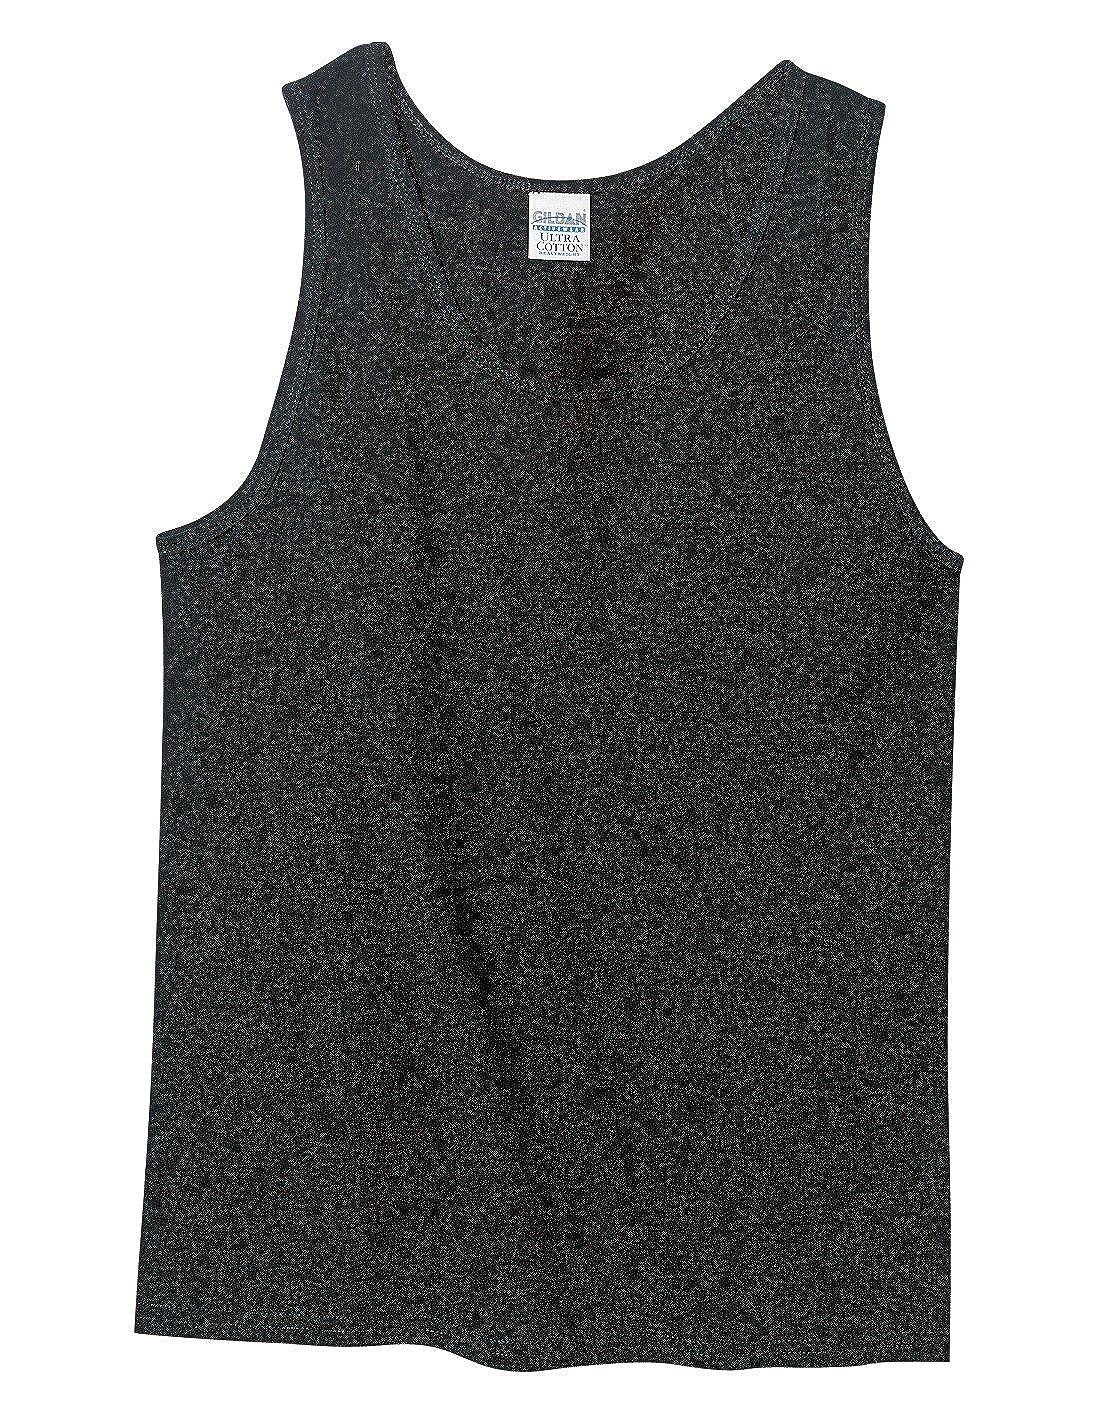 e961c76ae411e Gildan G220 Cotton Tank T-Shirt